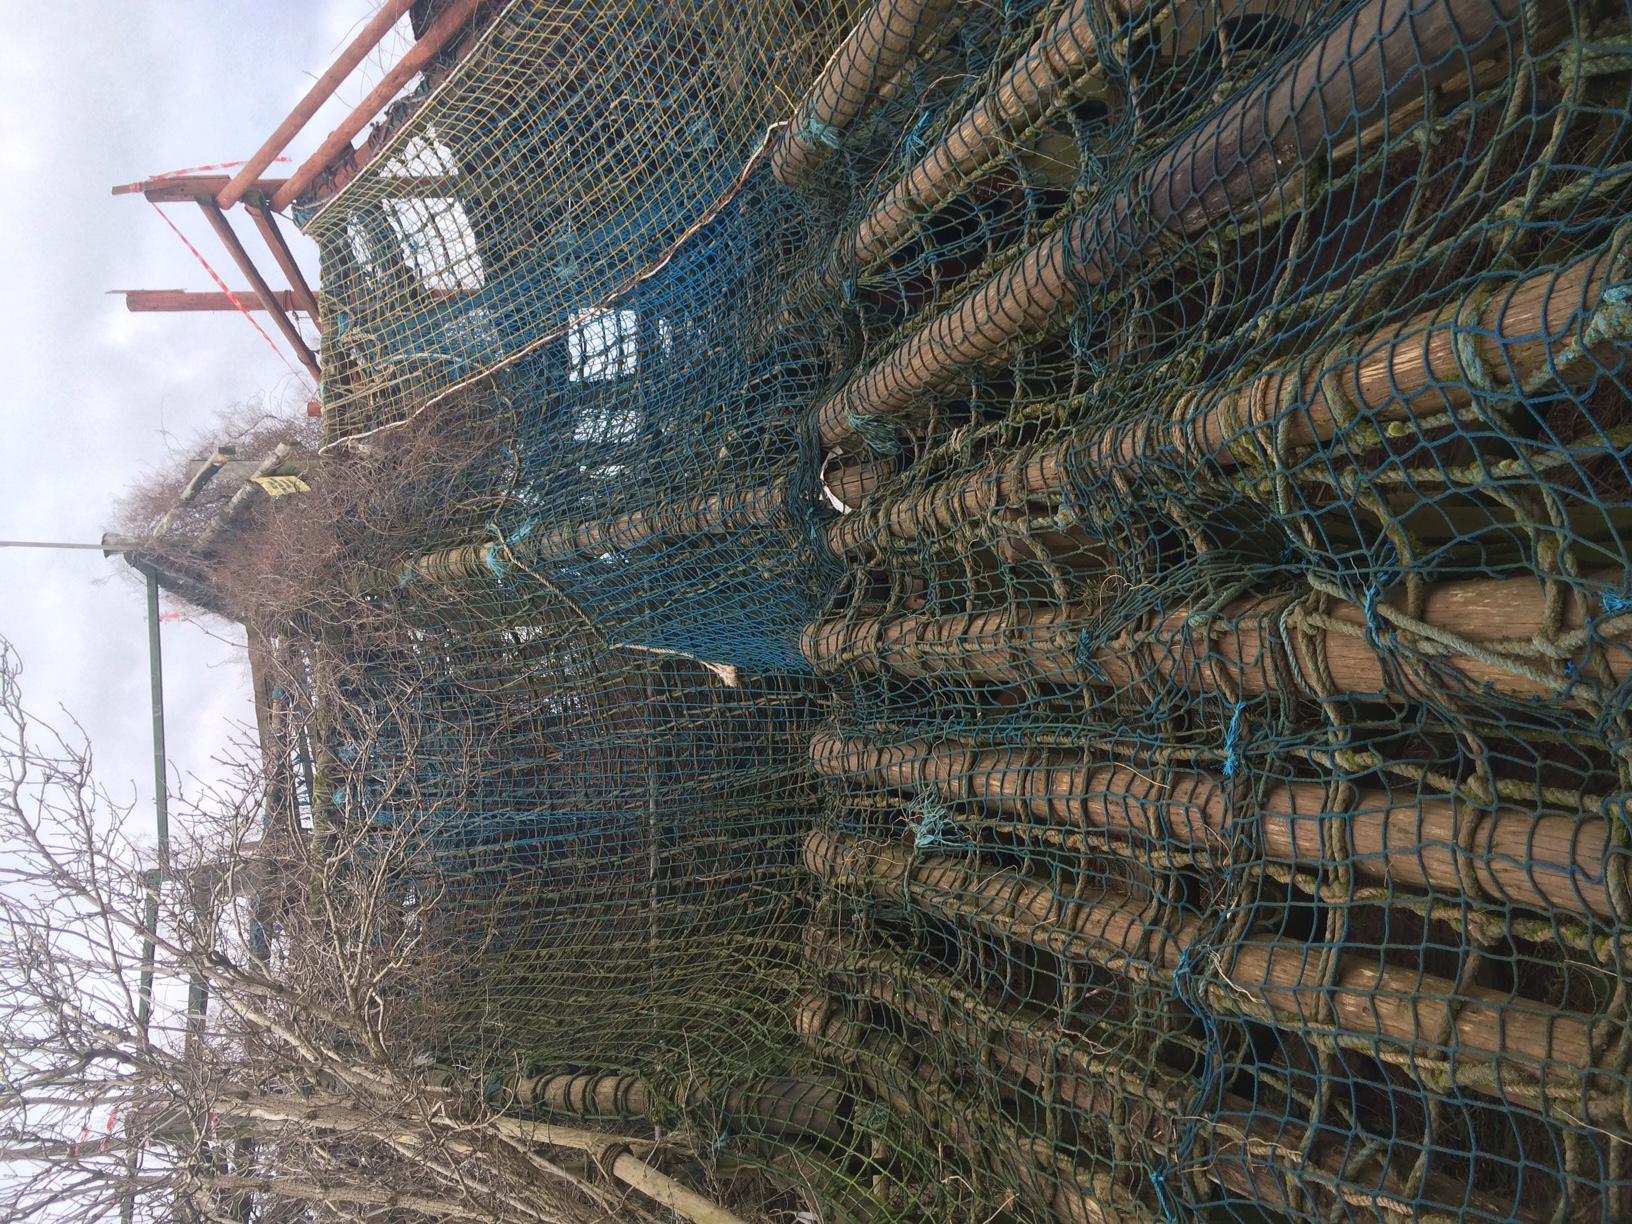 TG 2015 - nets nets and more nets.jpeg